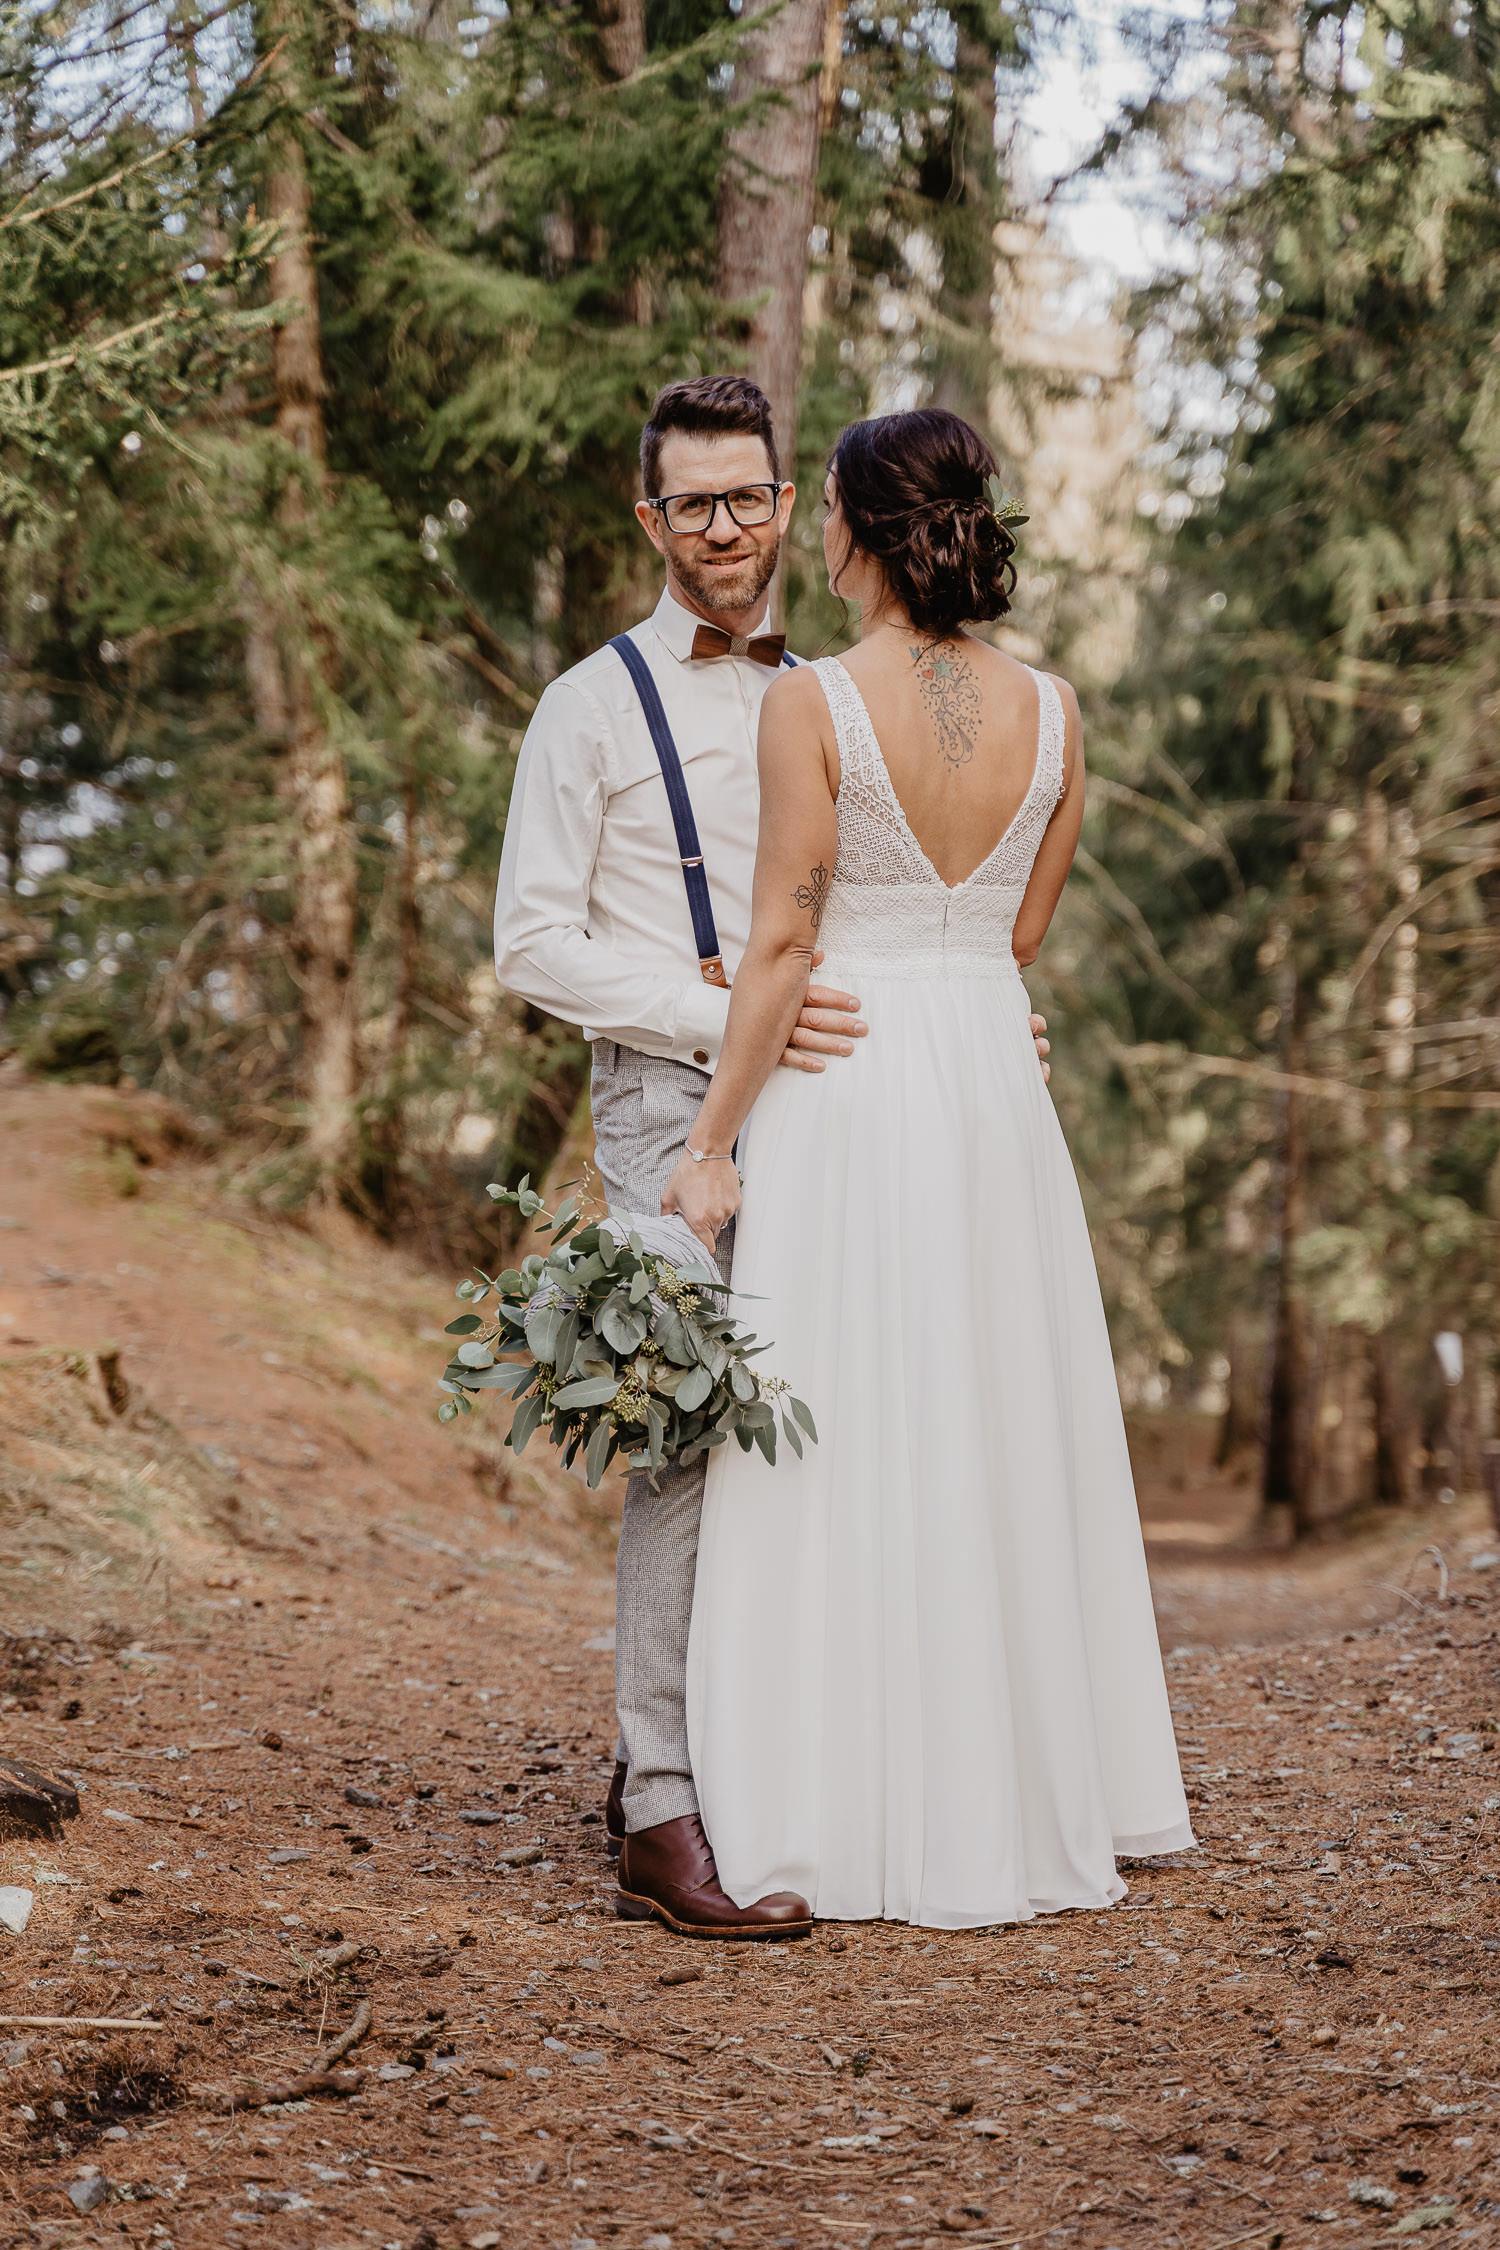 Hochzeitsfotograf Axams Patscherkofel 15